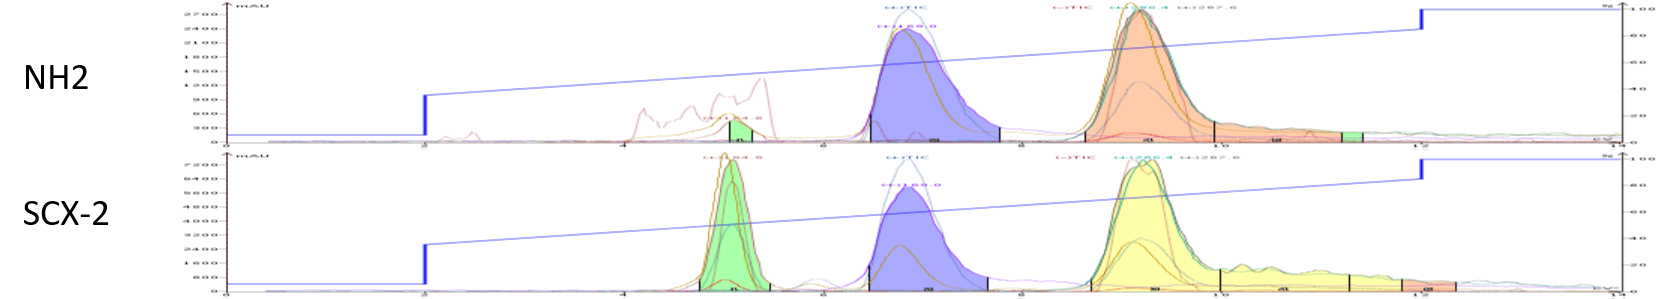 Hipp acid + aMBA interactive dry load comparison